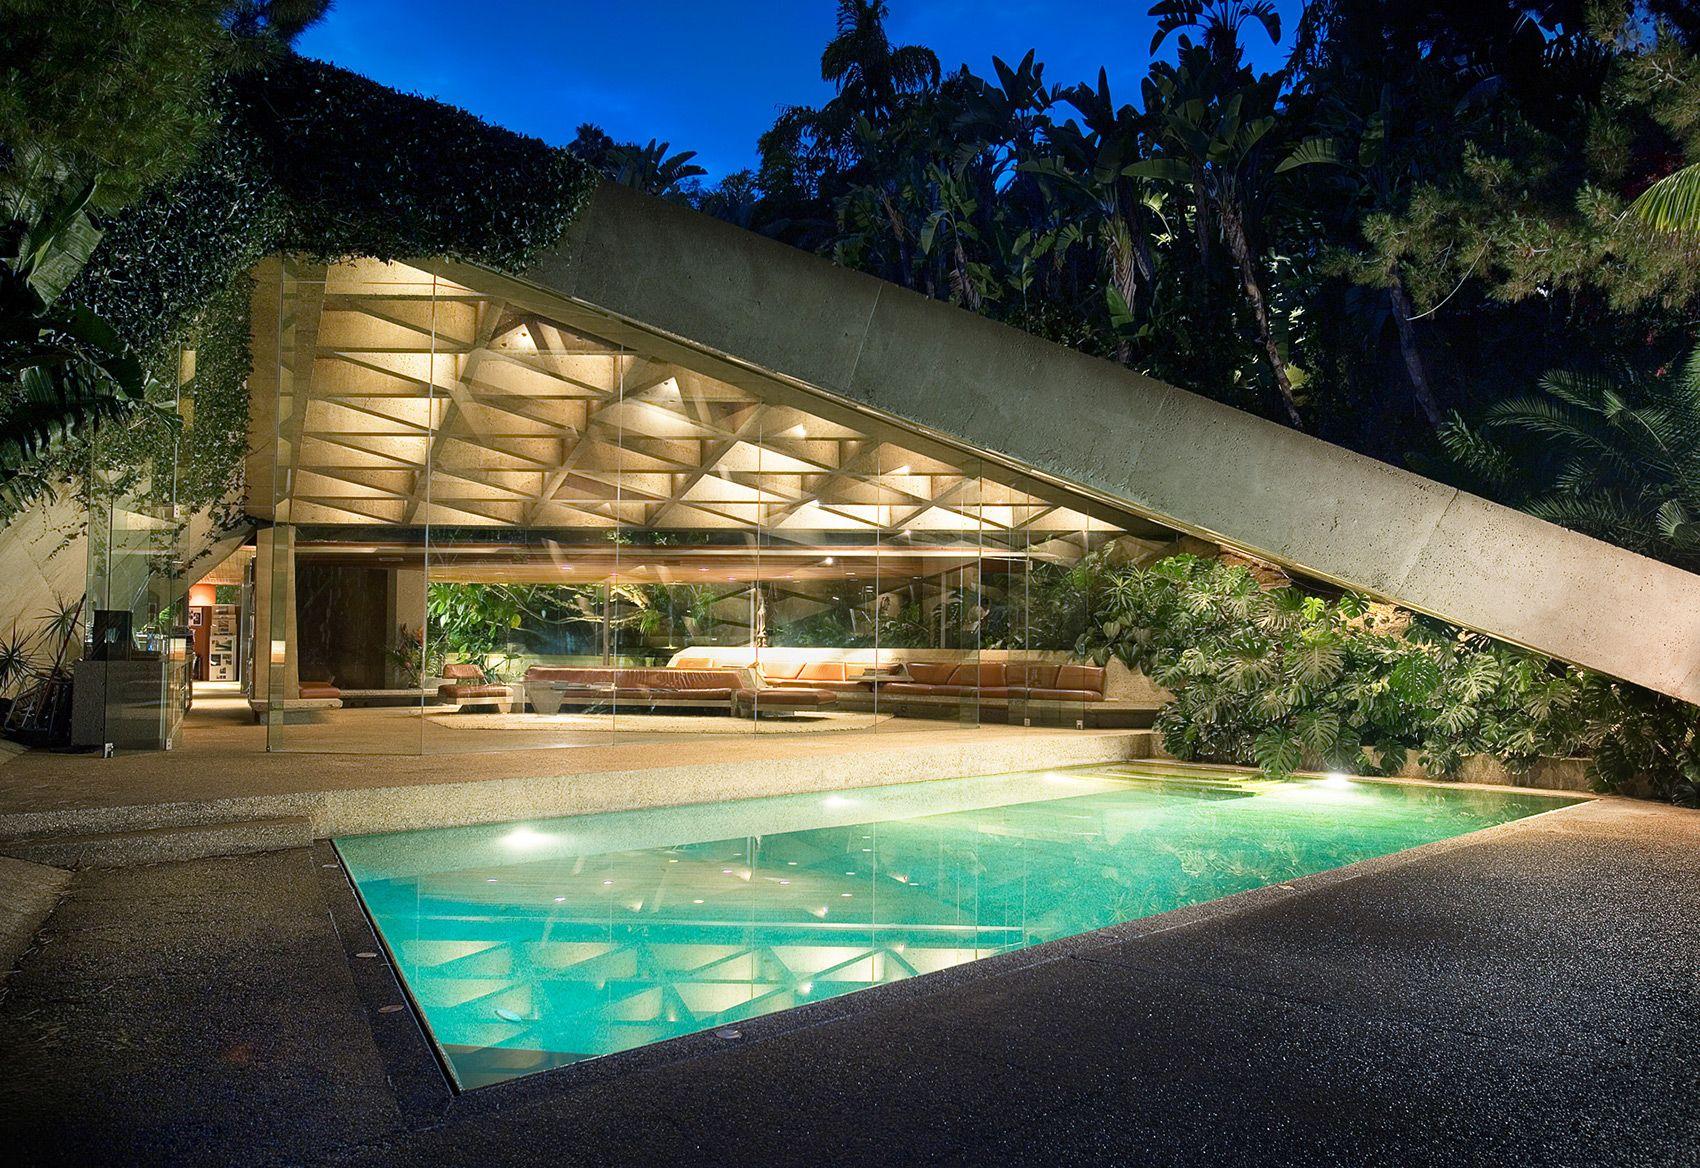 Famous Big Lebowski House Donated to LACMA